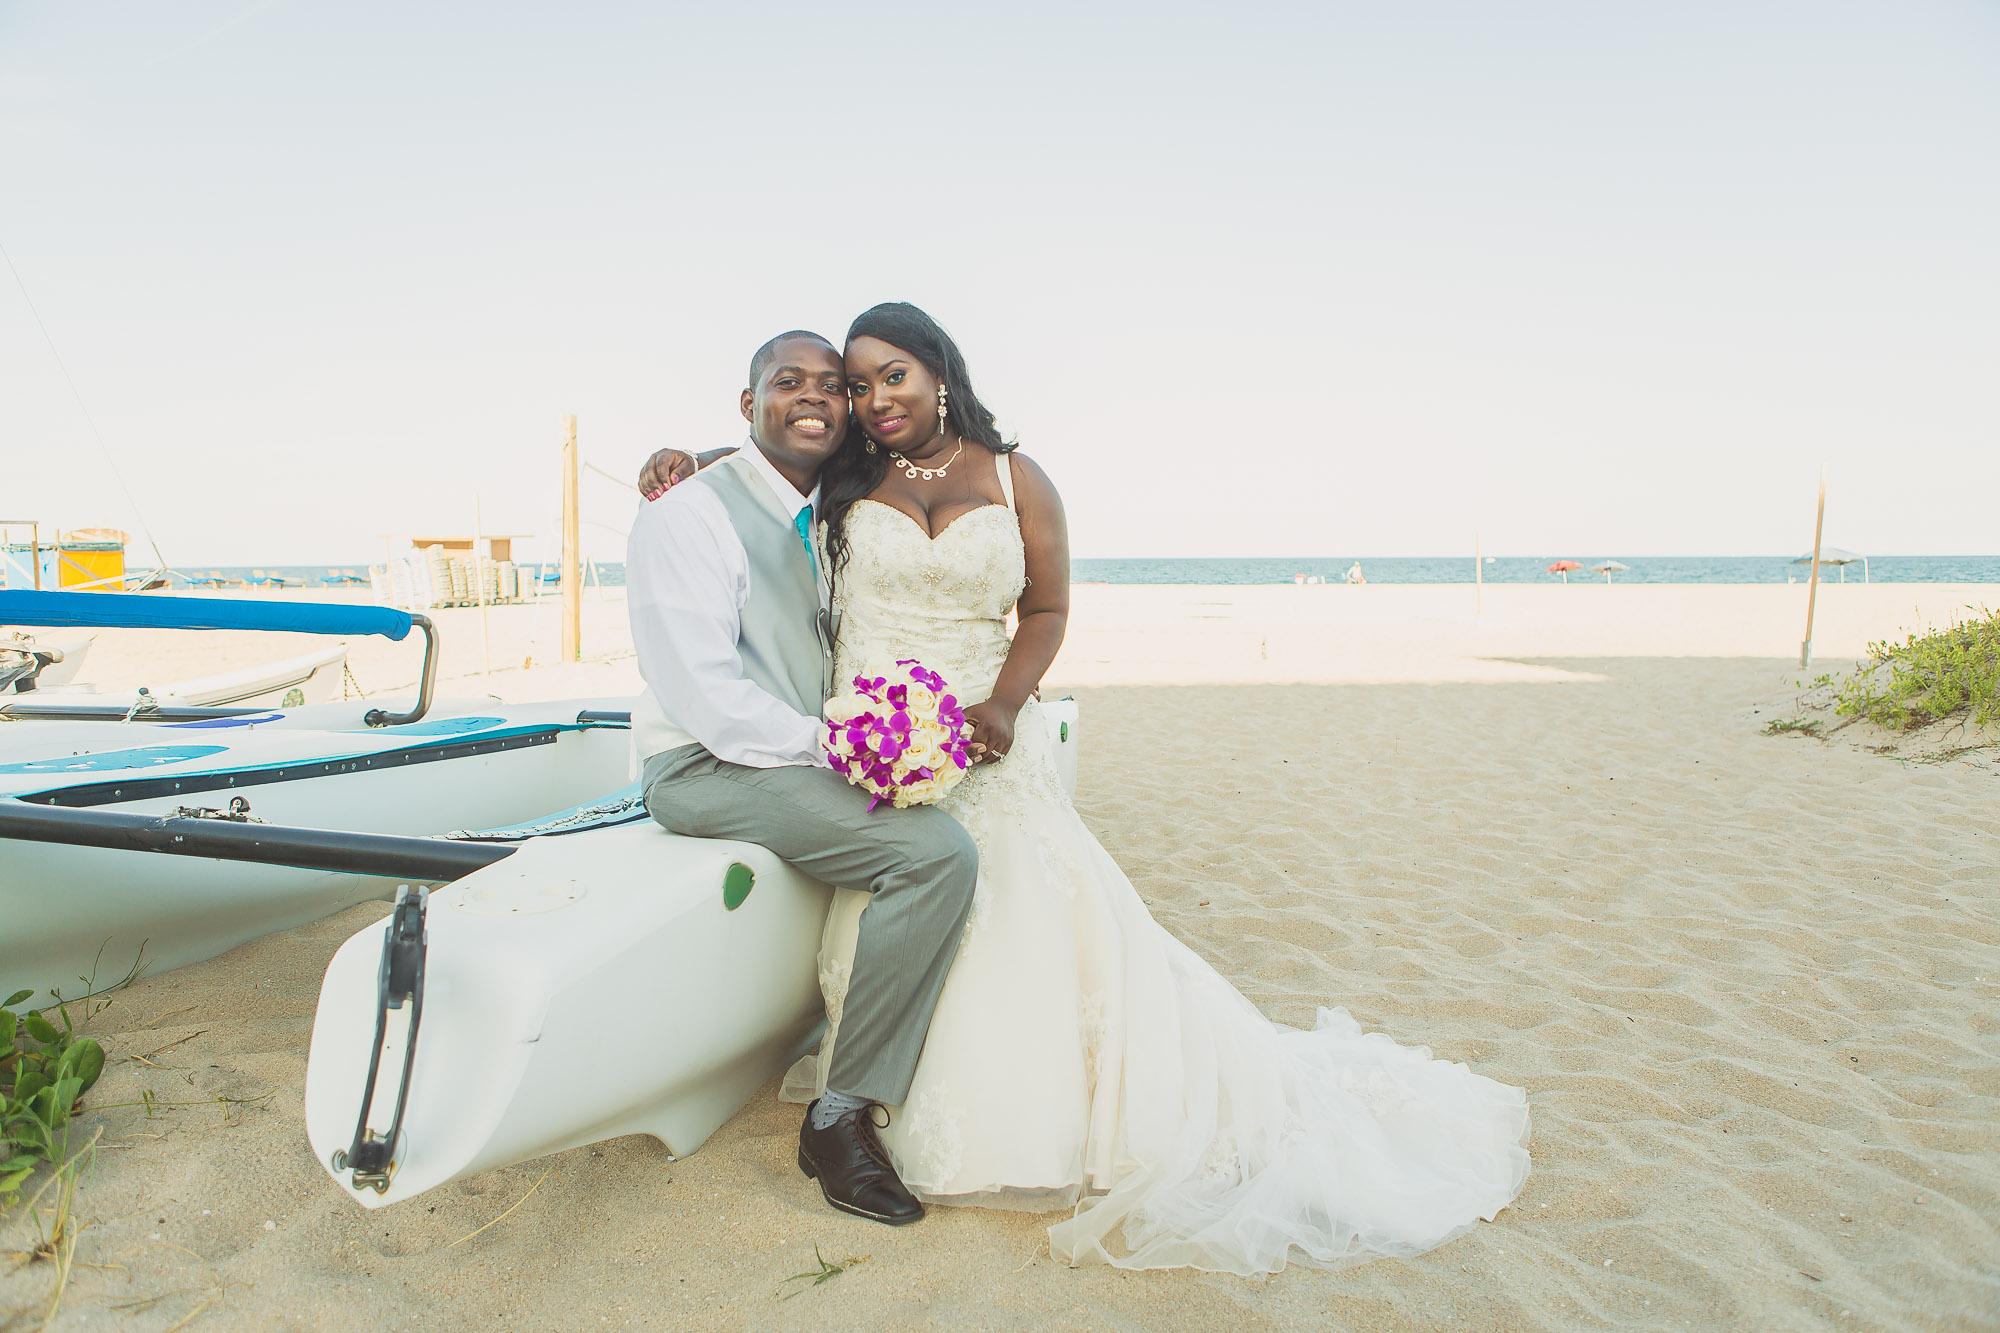 Cheron & Wilson: Destination Wedding at Pompano Beach, Fl